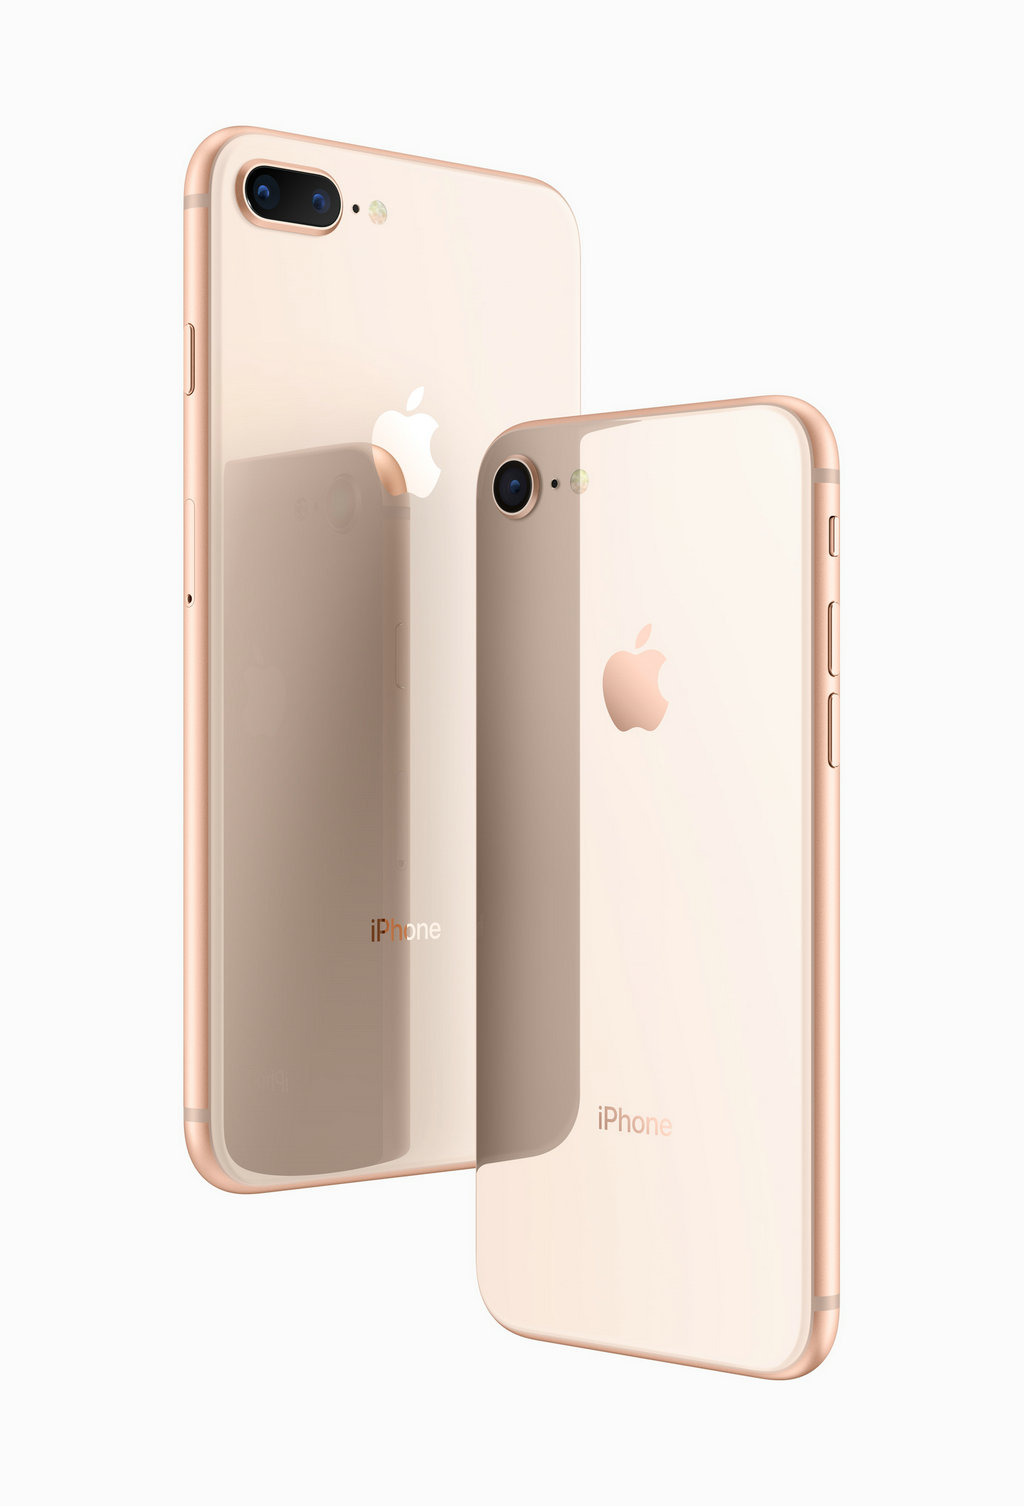 iPhone 8外观和尺寸比起前代iPhone并无太大变化,铝合金机身,并用上了玻璃材质。iPhone 8 和 iPhone 8 Plus 支持防水,支持 3D Touch 和双扬声器技术。